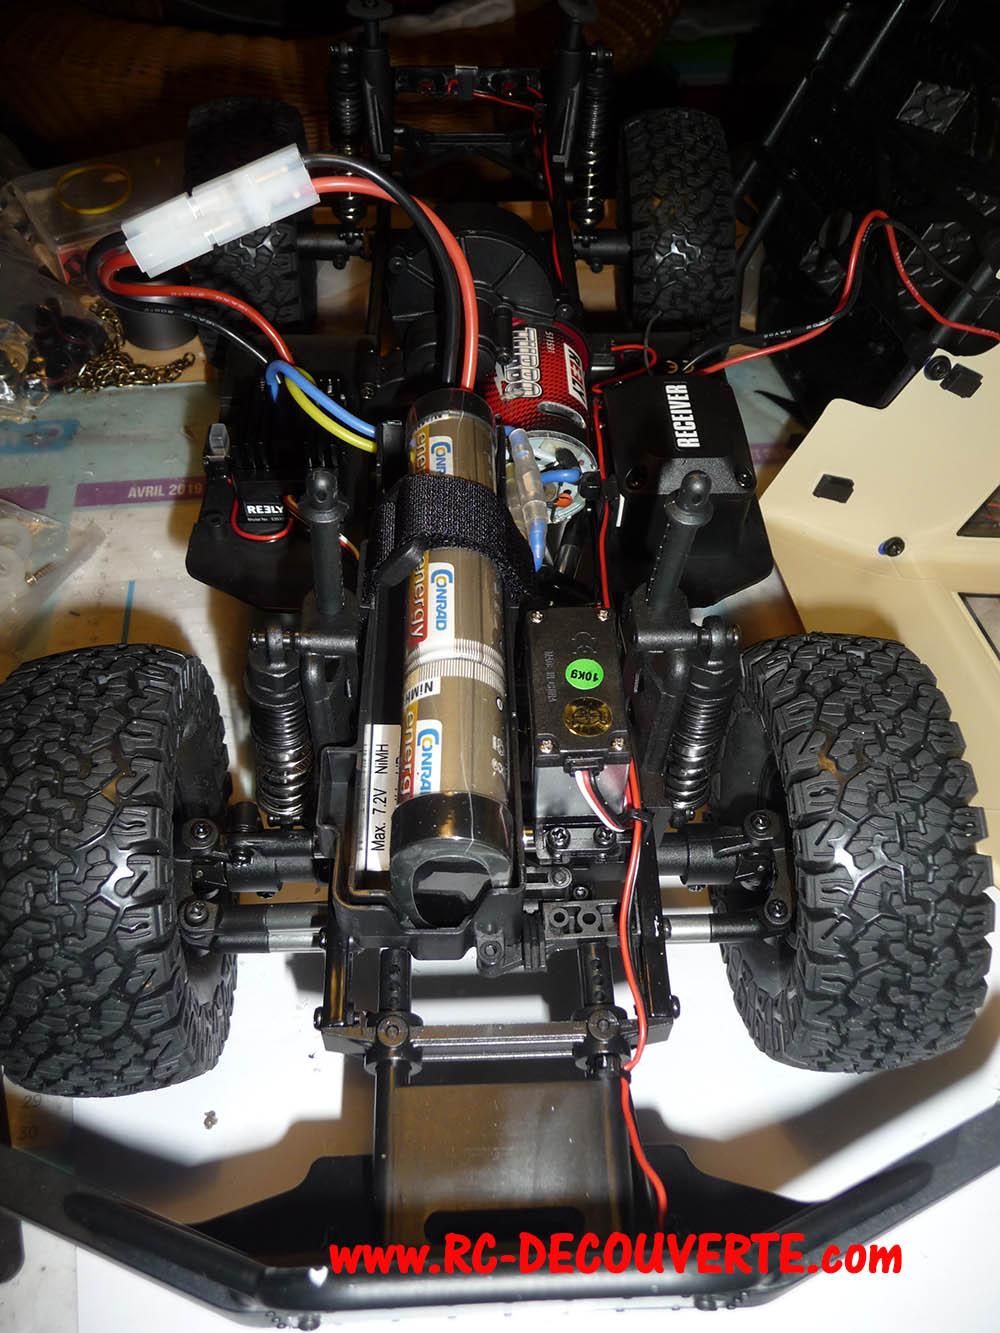 Crawler Reely Free Men Extreme RTR RE-6549612 VS Scx10 II : Présentation et modification by Louloux Reely-13